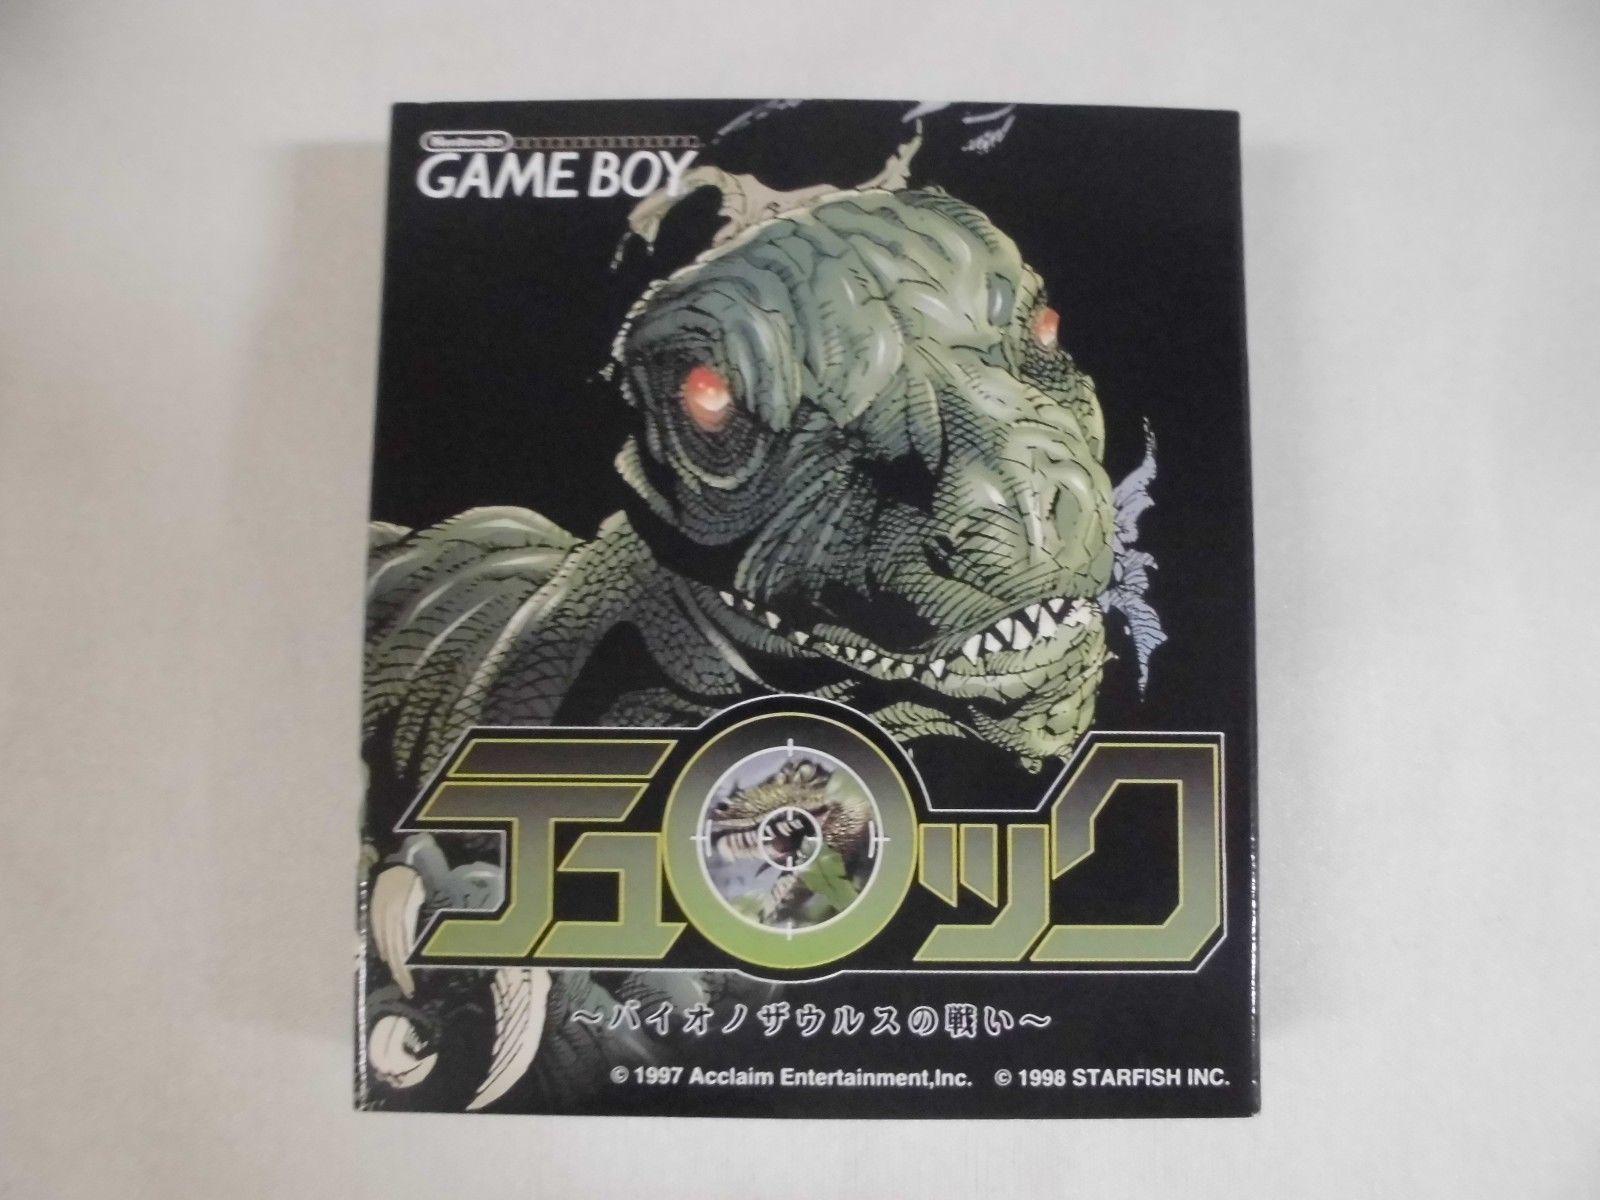 Game boy color japan - Turok Dinosaur Hunter Gameboy Color Japan Box 2 Jpg